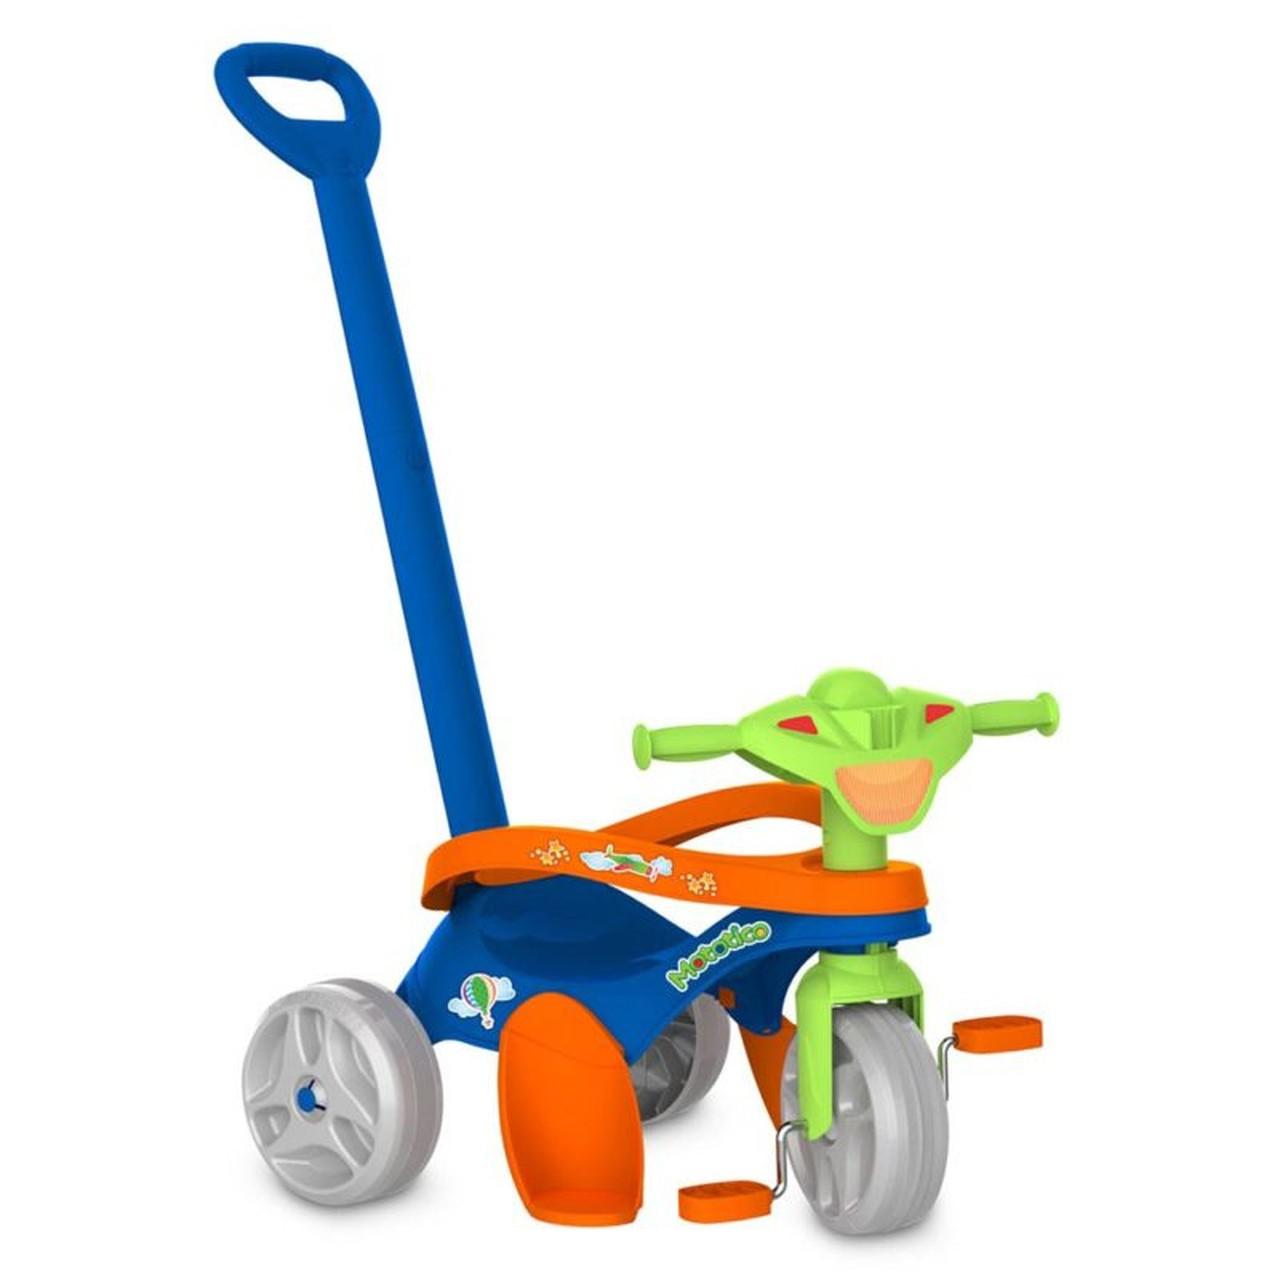 Triciclo Mototico Passeio e Pedal Azul - Bandeirante 692